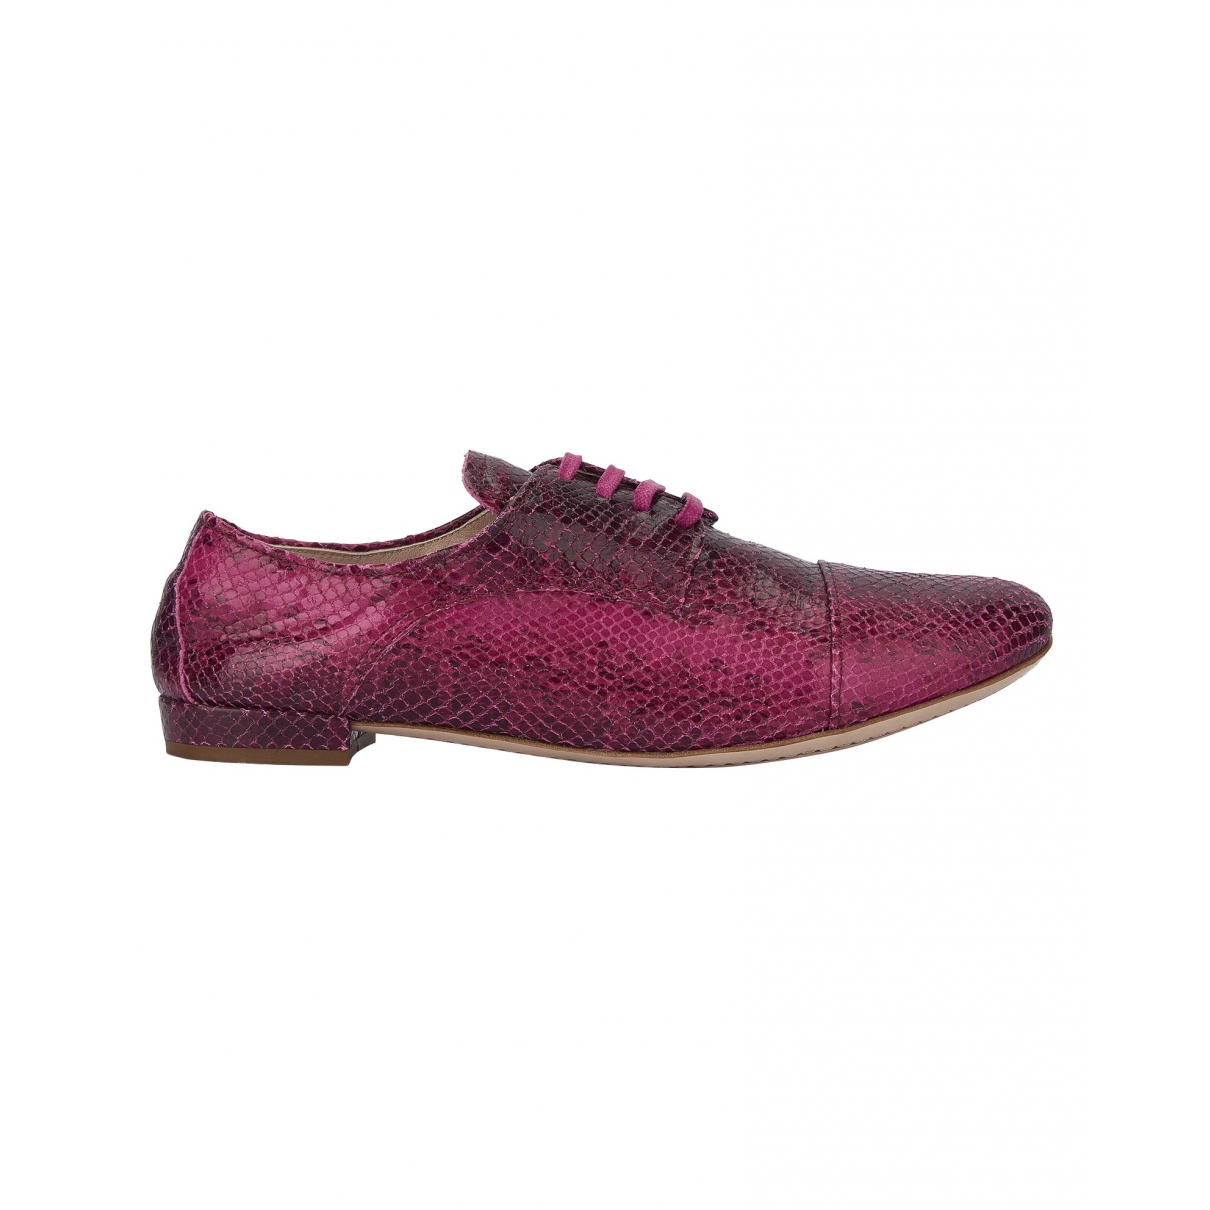 Miu Miu \N Pink Leather Lace ups for Women 3 UK